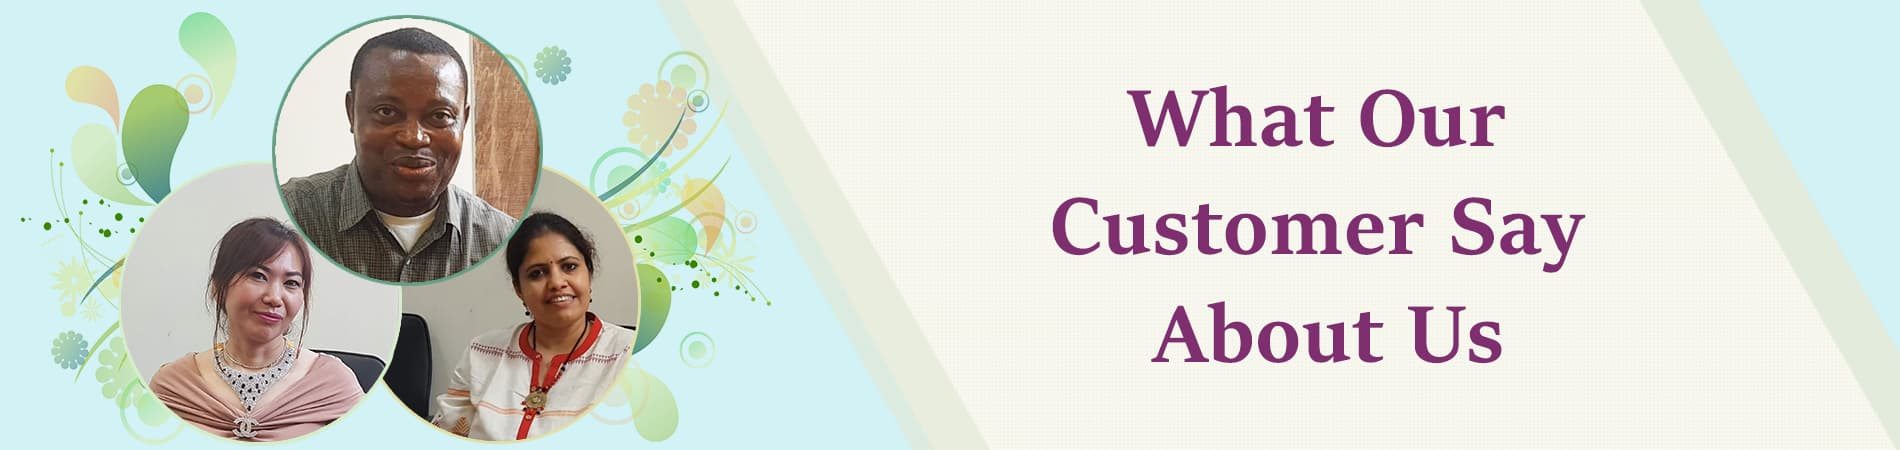 1586148703_Customer_Testimonials_What_Customer_Say_About_Us.jpg